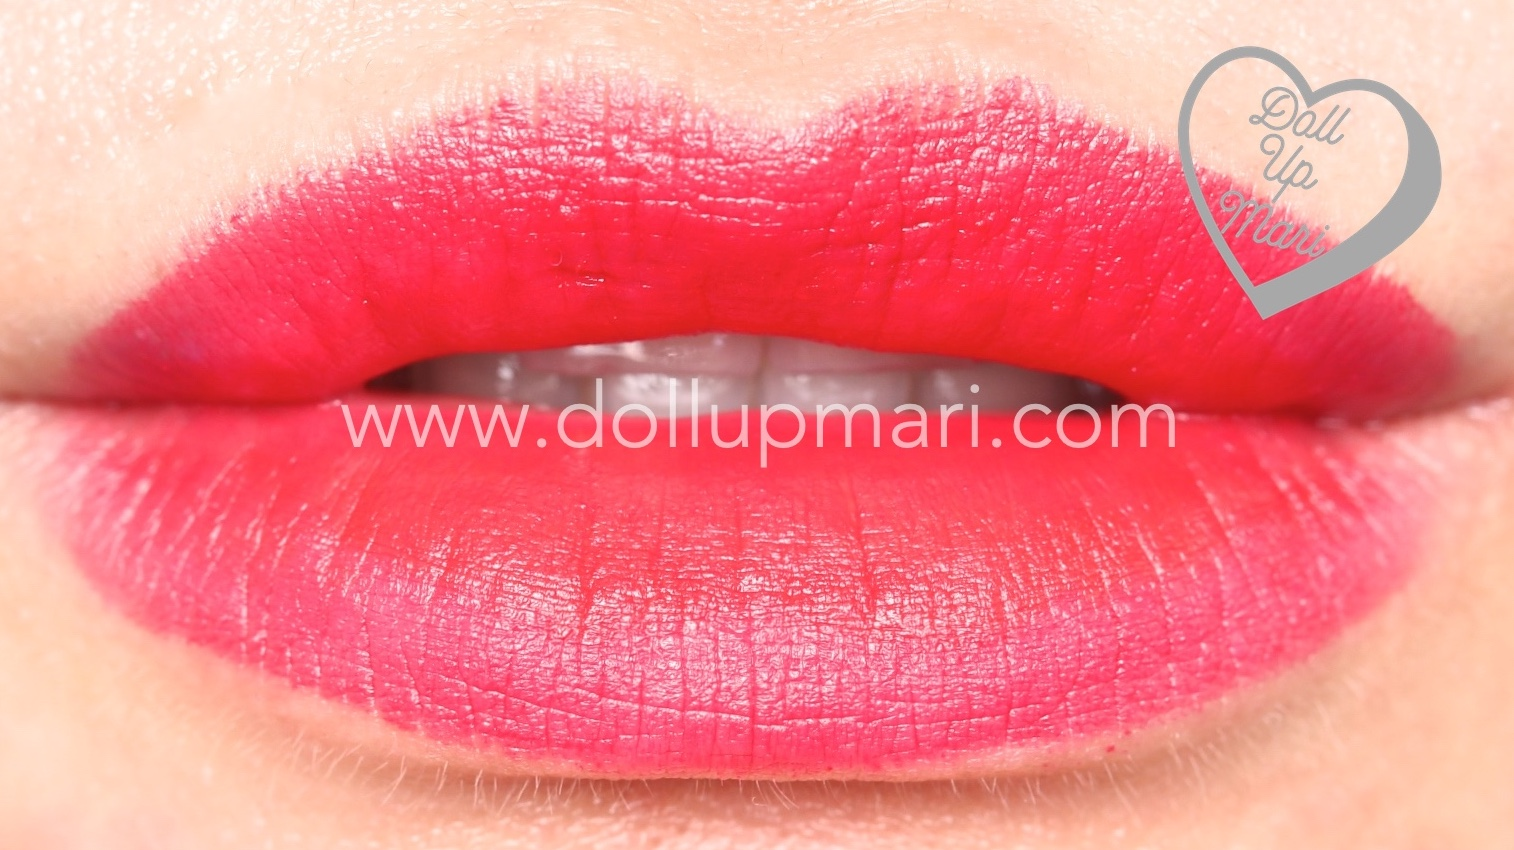 lip swatch of Ruby Kiss shade of AVON Perfectly Matte Lipstick